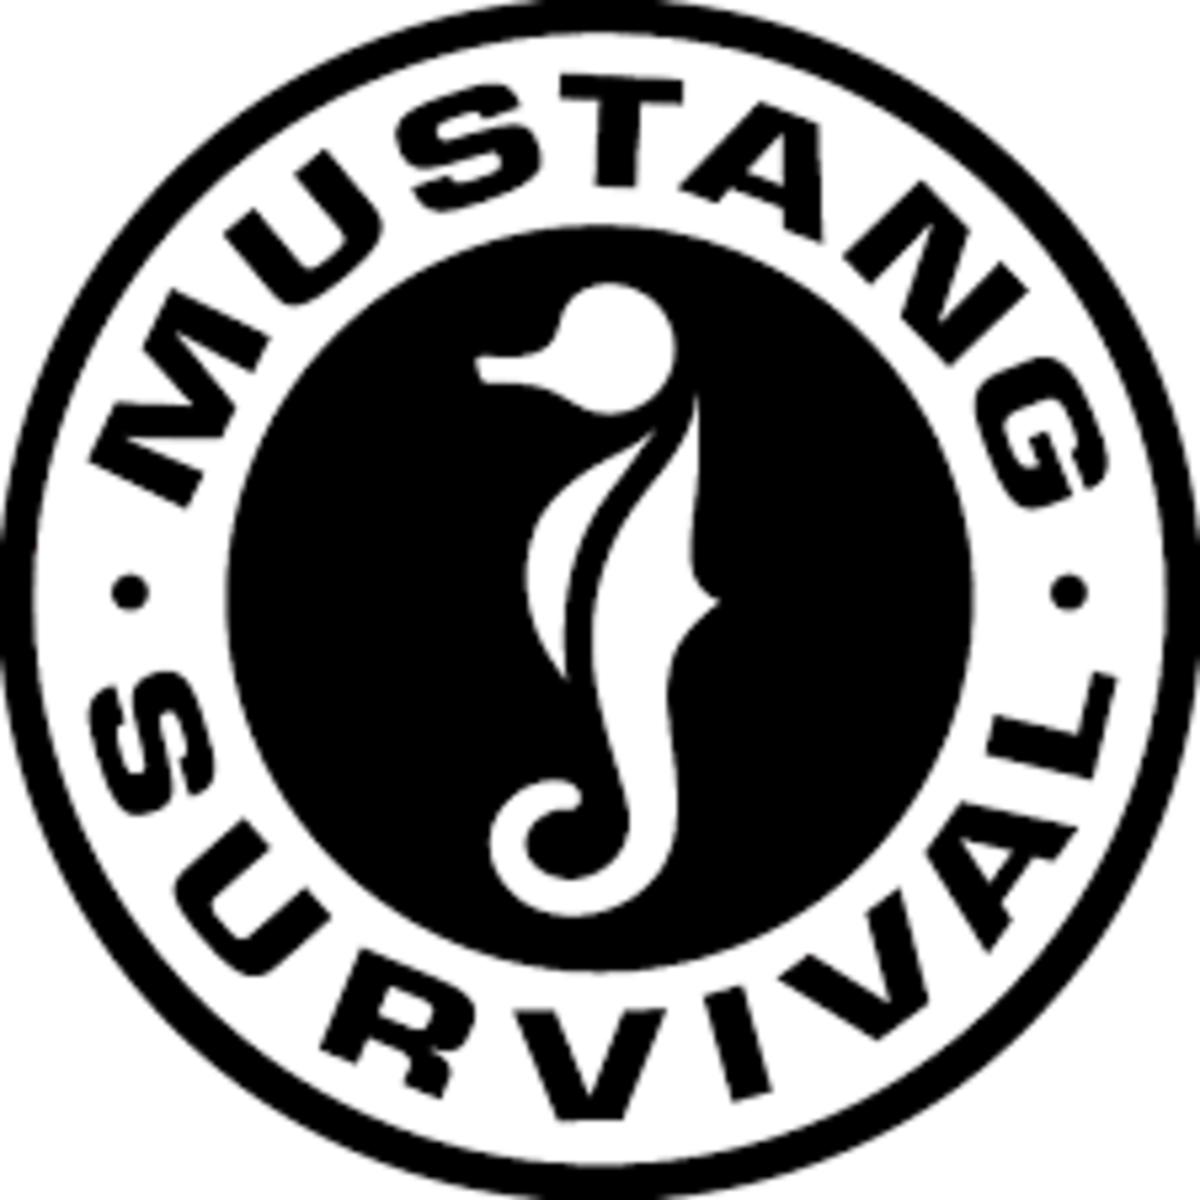 1_Mustang